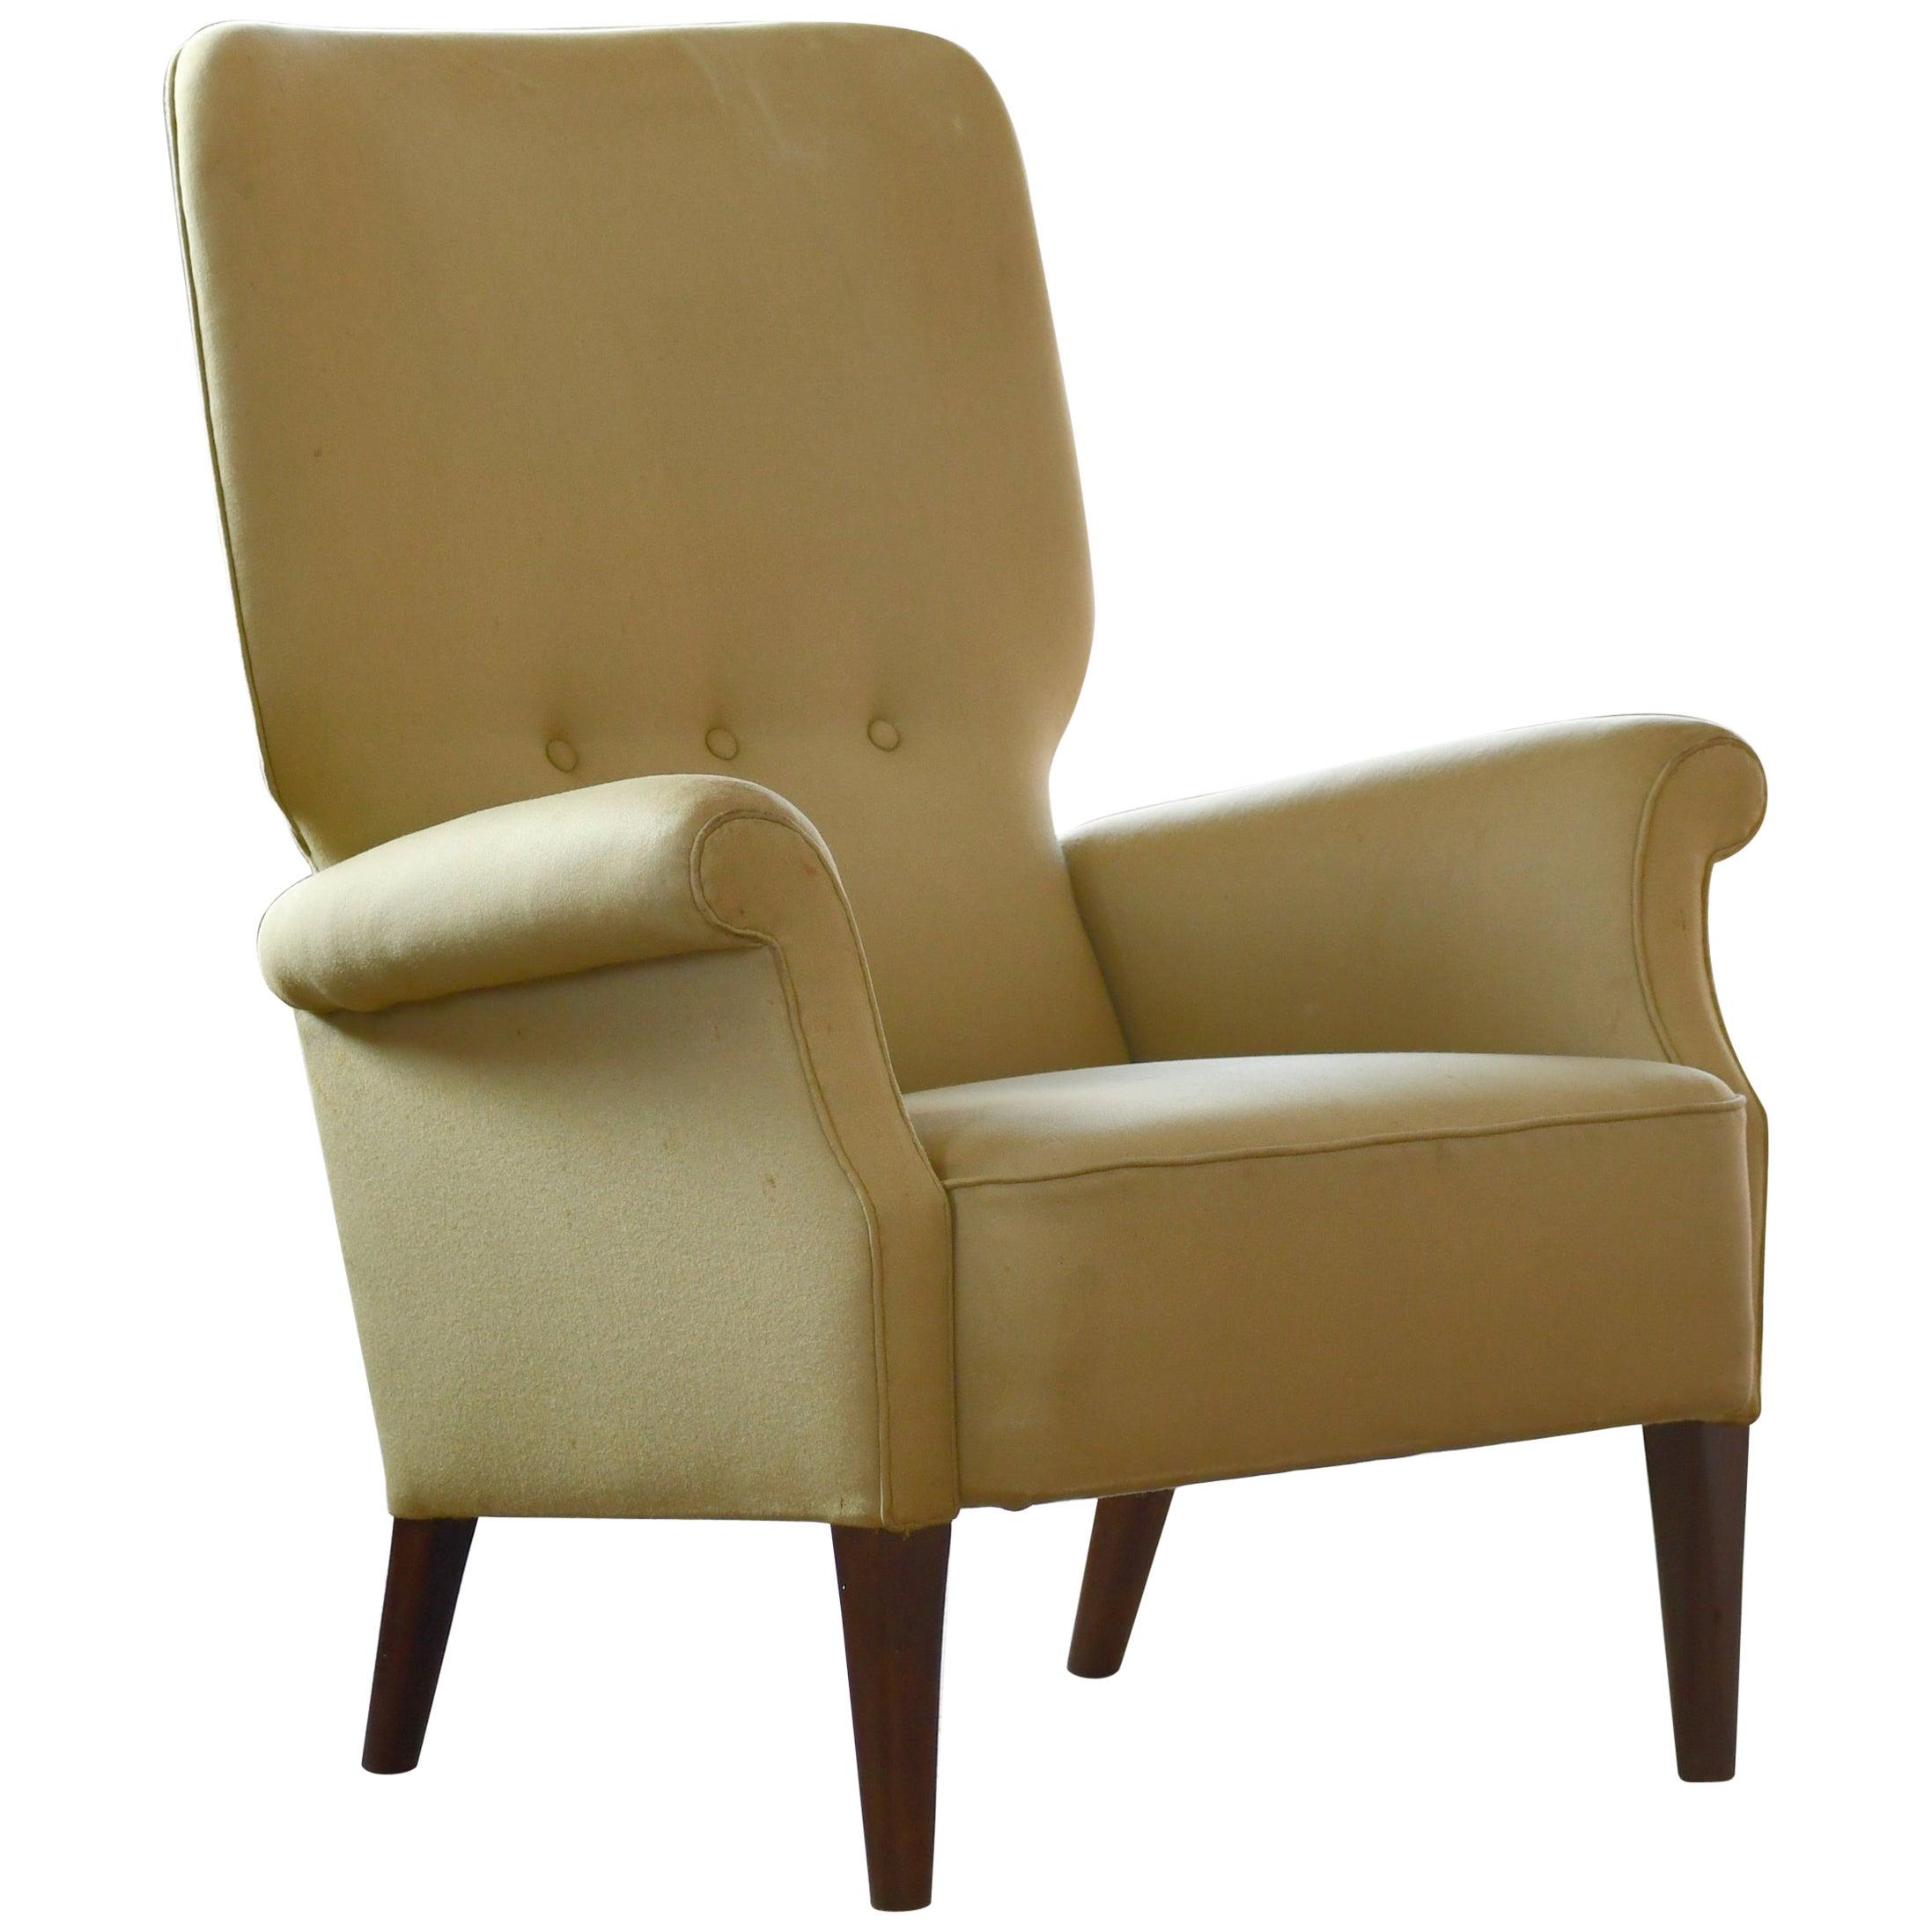 Fritz Hansen 1950s Highback Lounge Chair Danish Midcentury